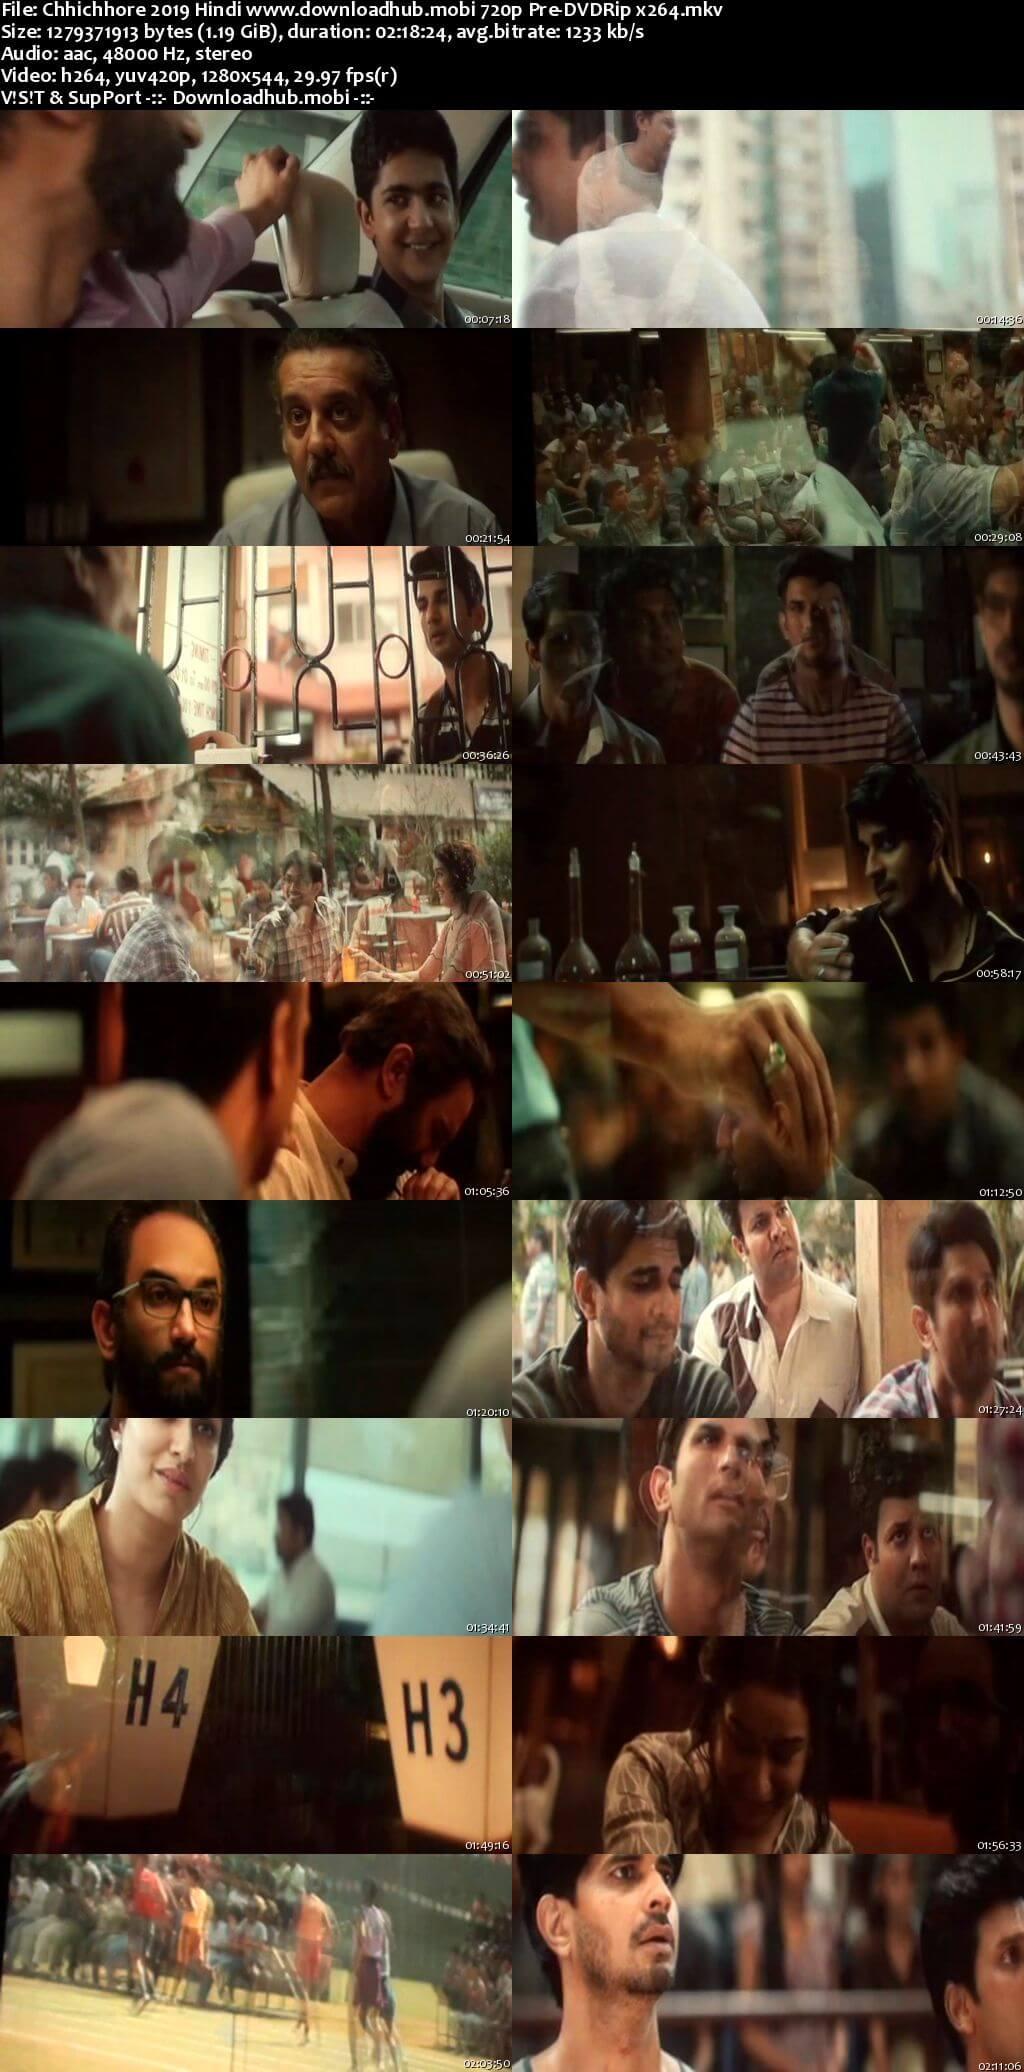 Chhichhore 2019 Hindi 720p Pre-DVDRip x264